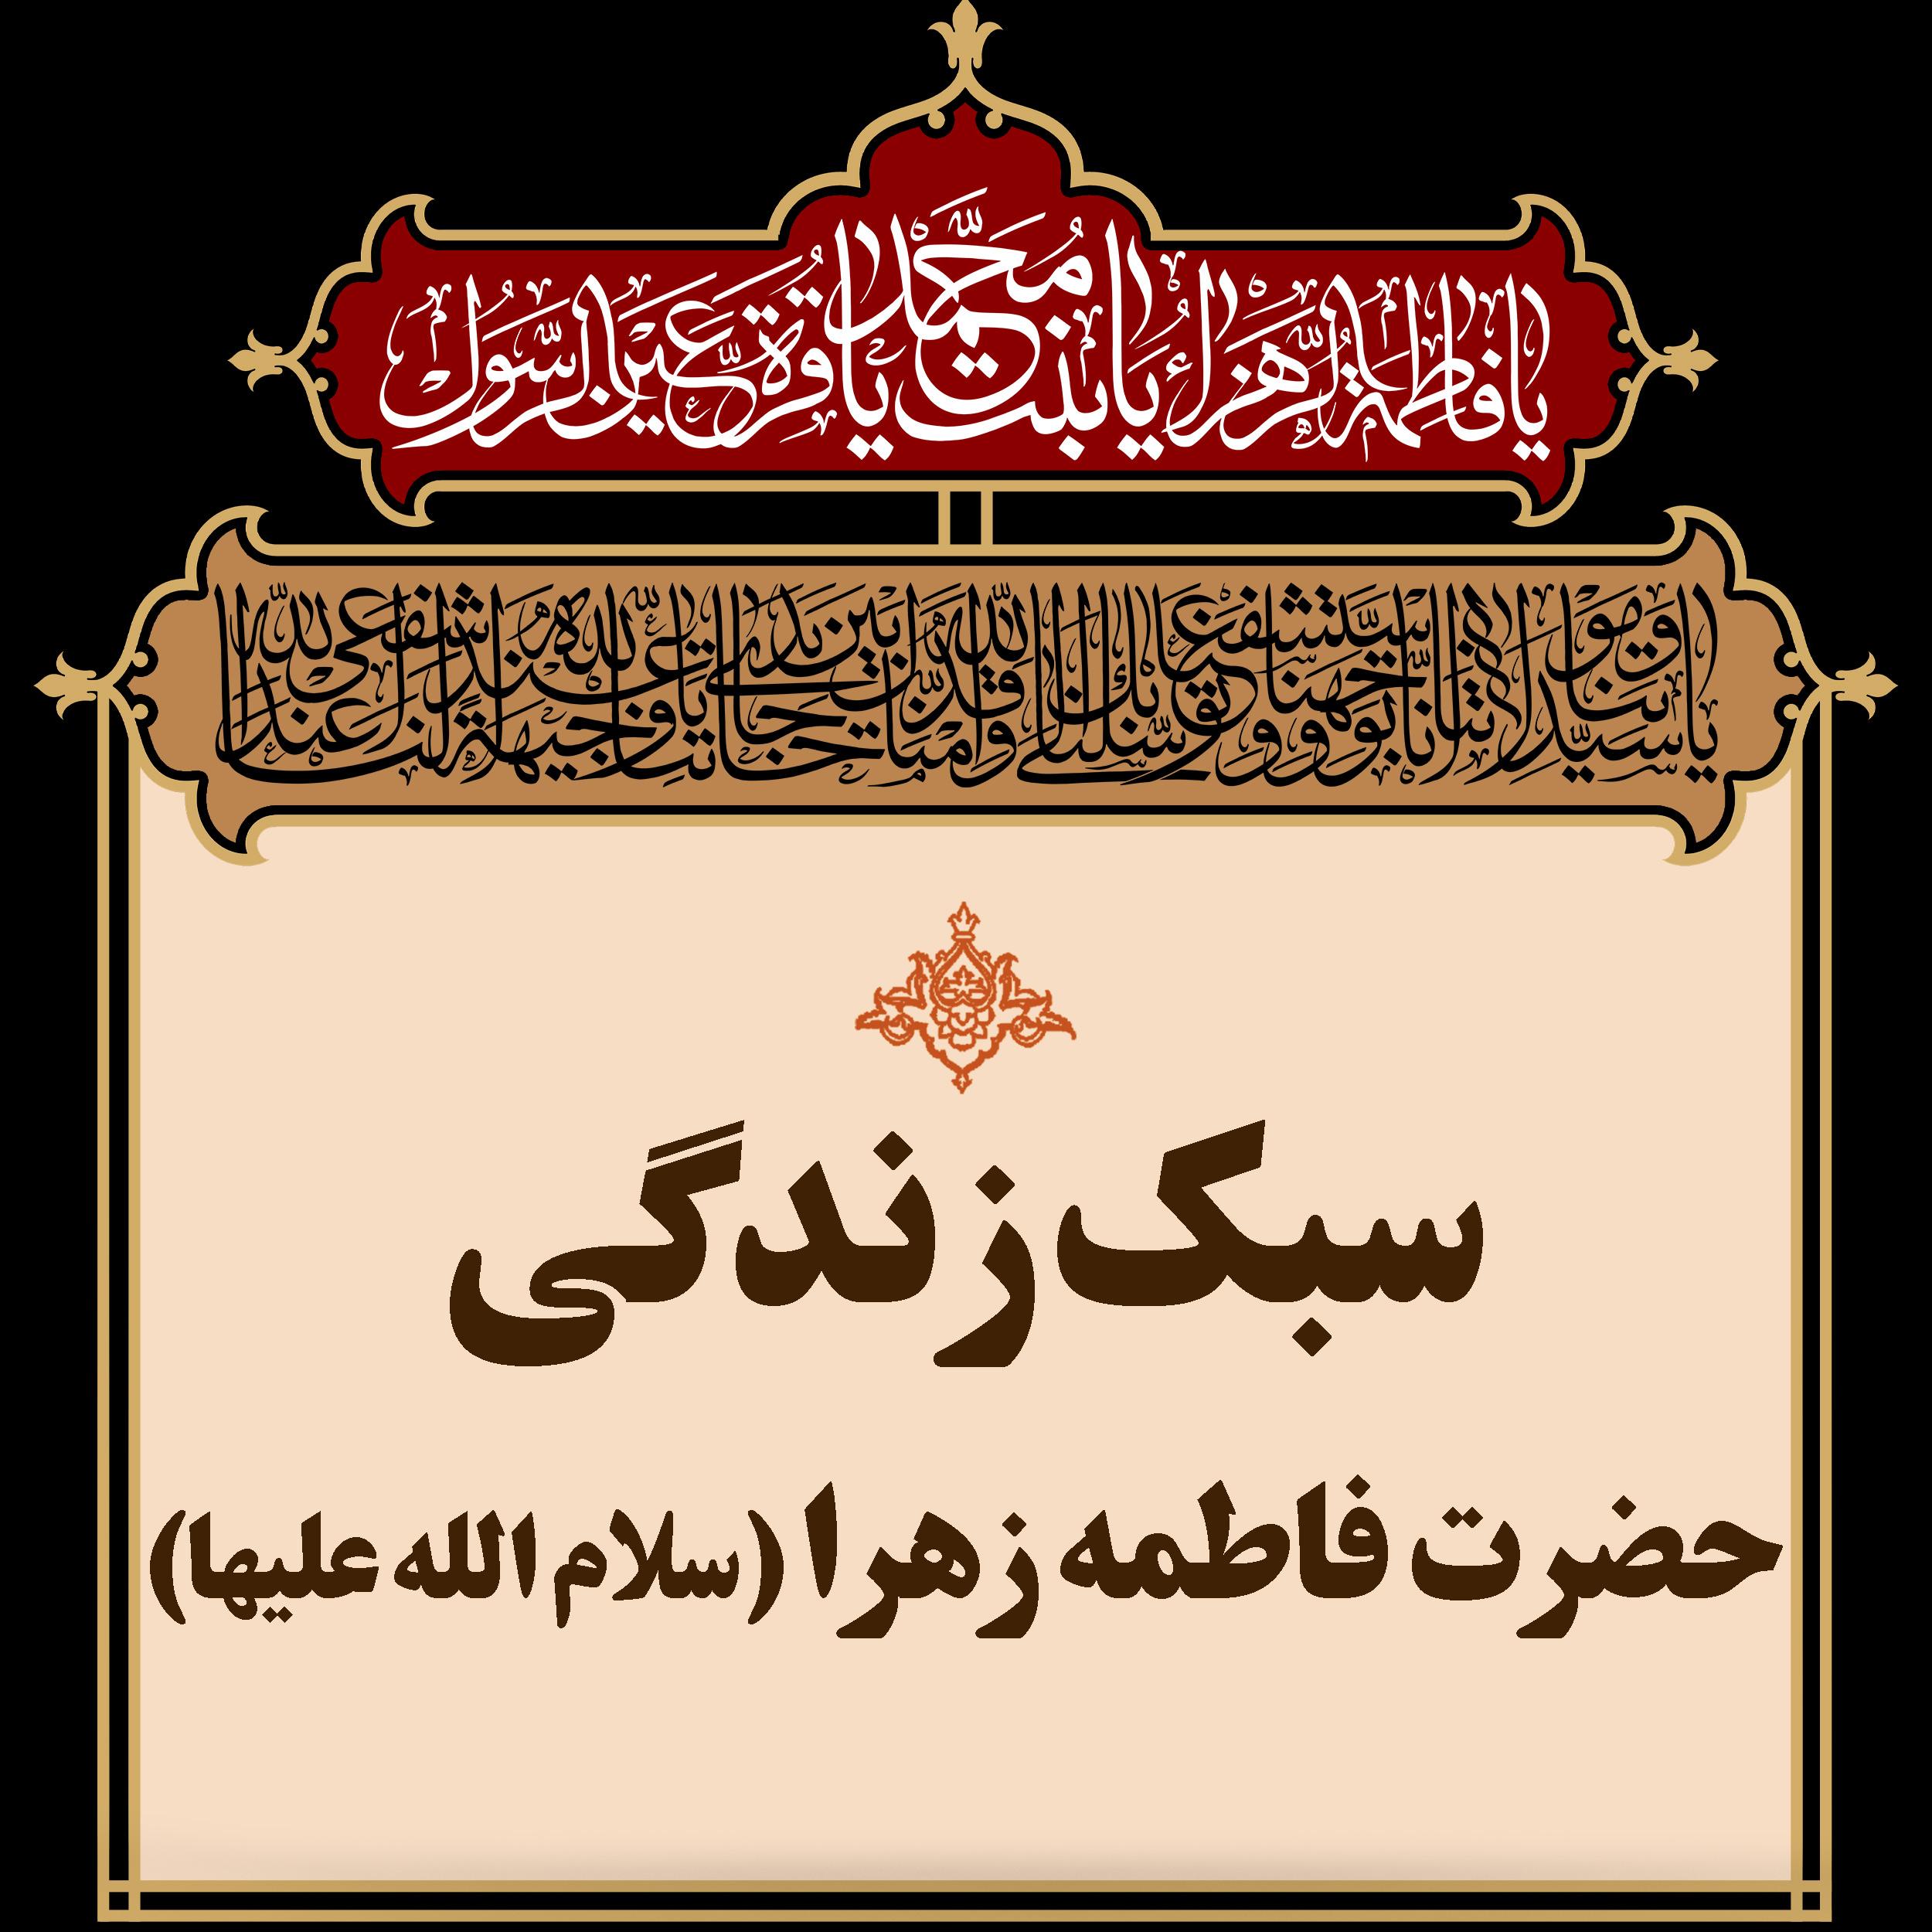 سبک زندگی حضرت زهرا سلام الله علیها